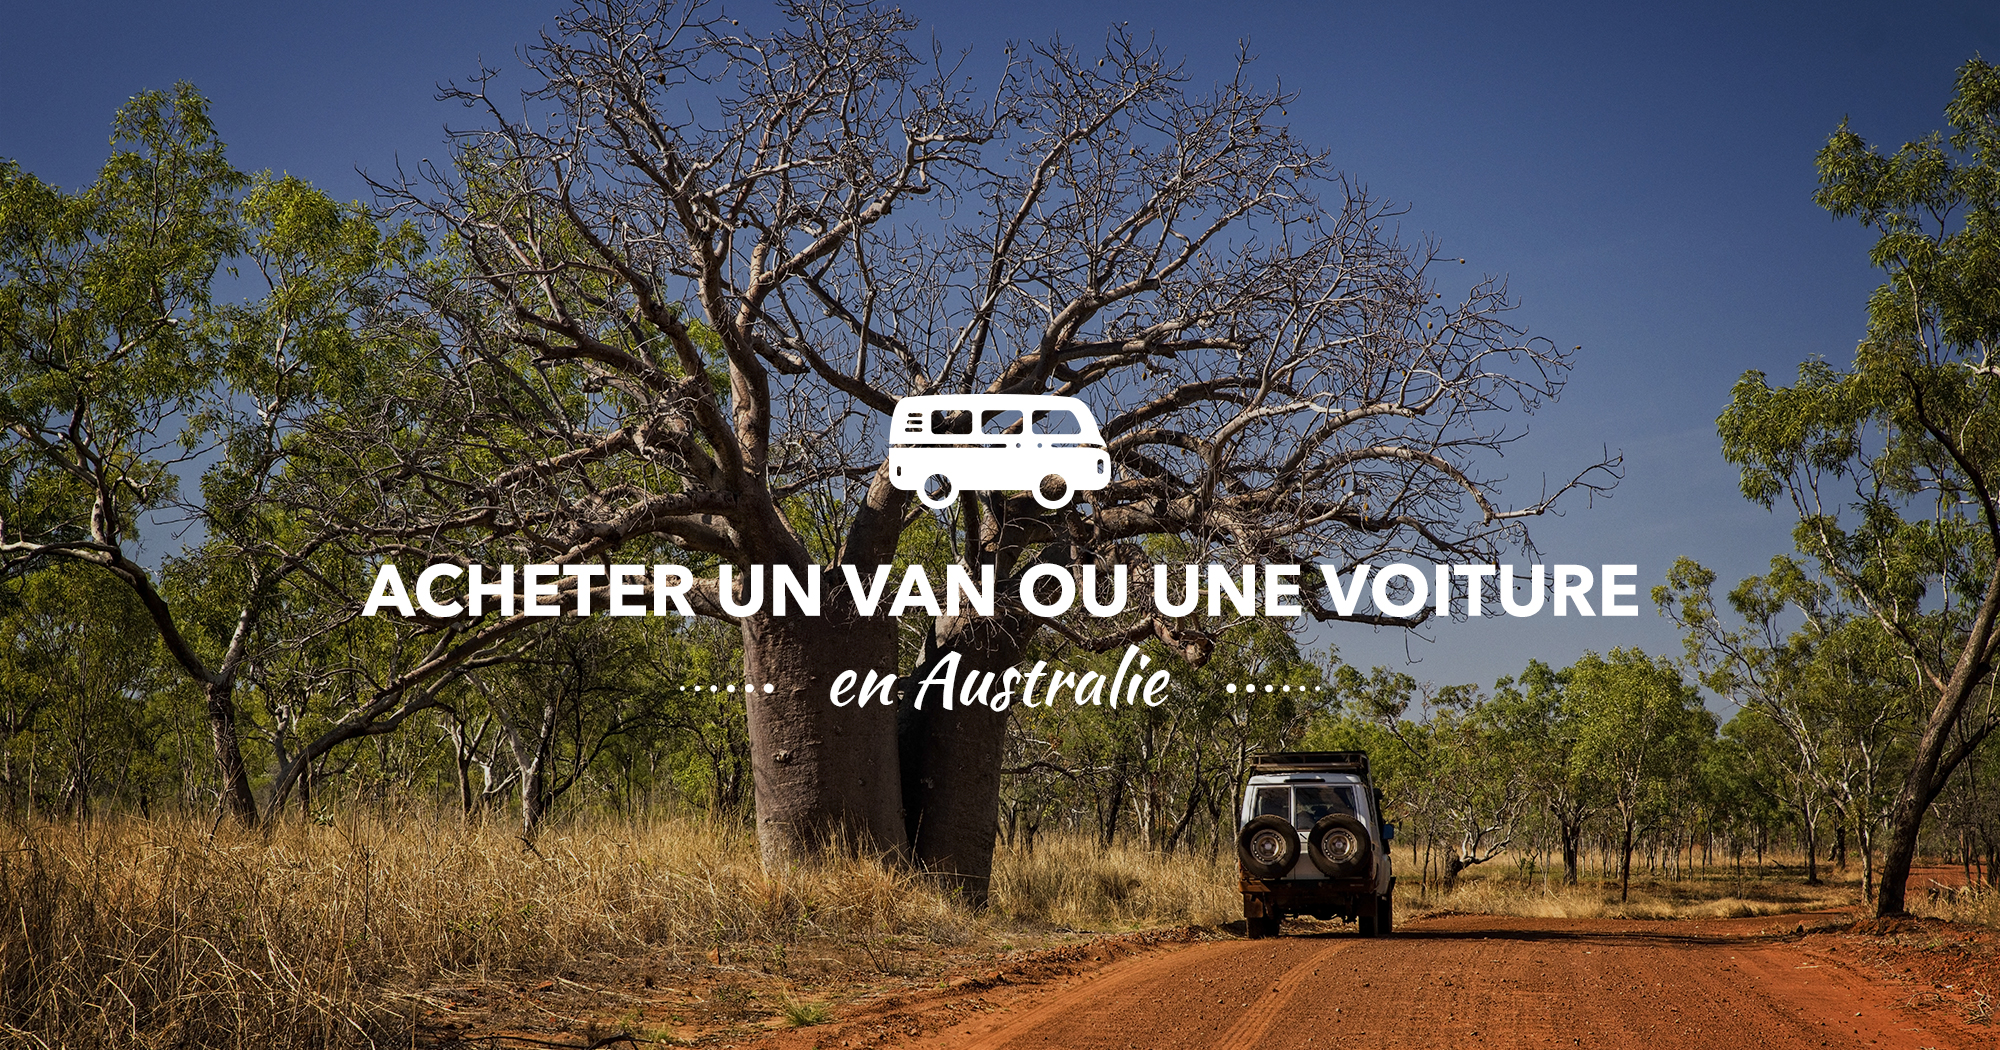 visuels-dossiers-whv-australie-acheter-voiture-van